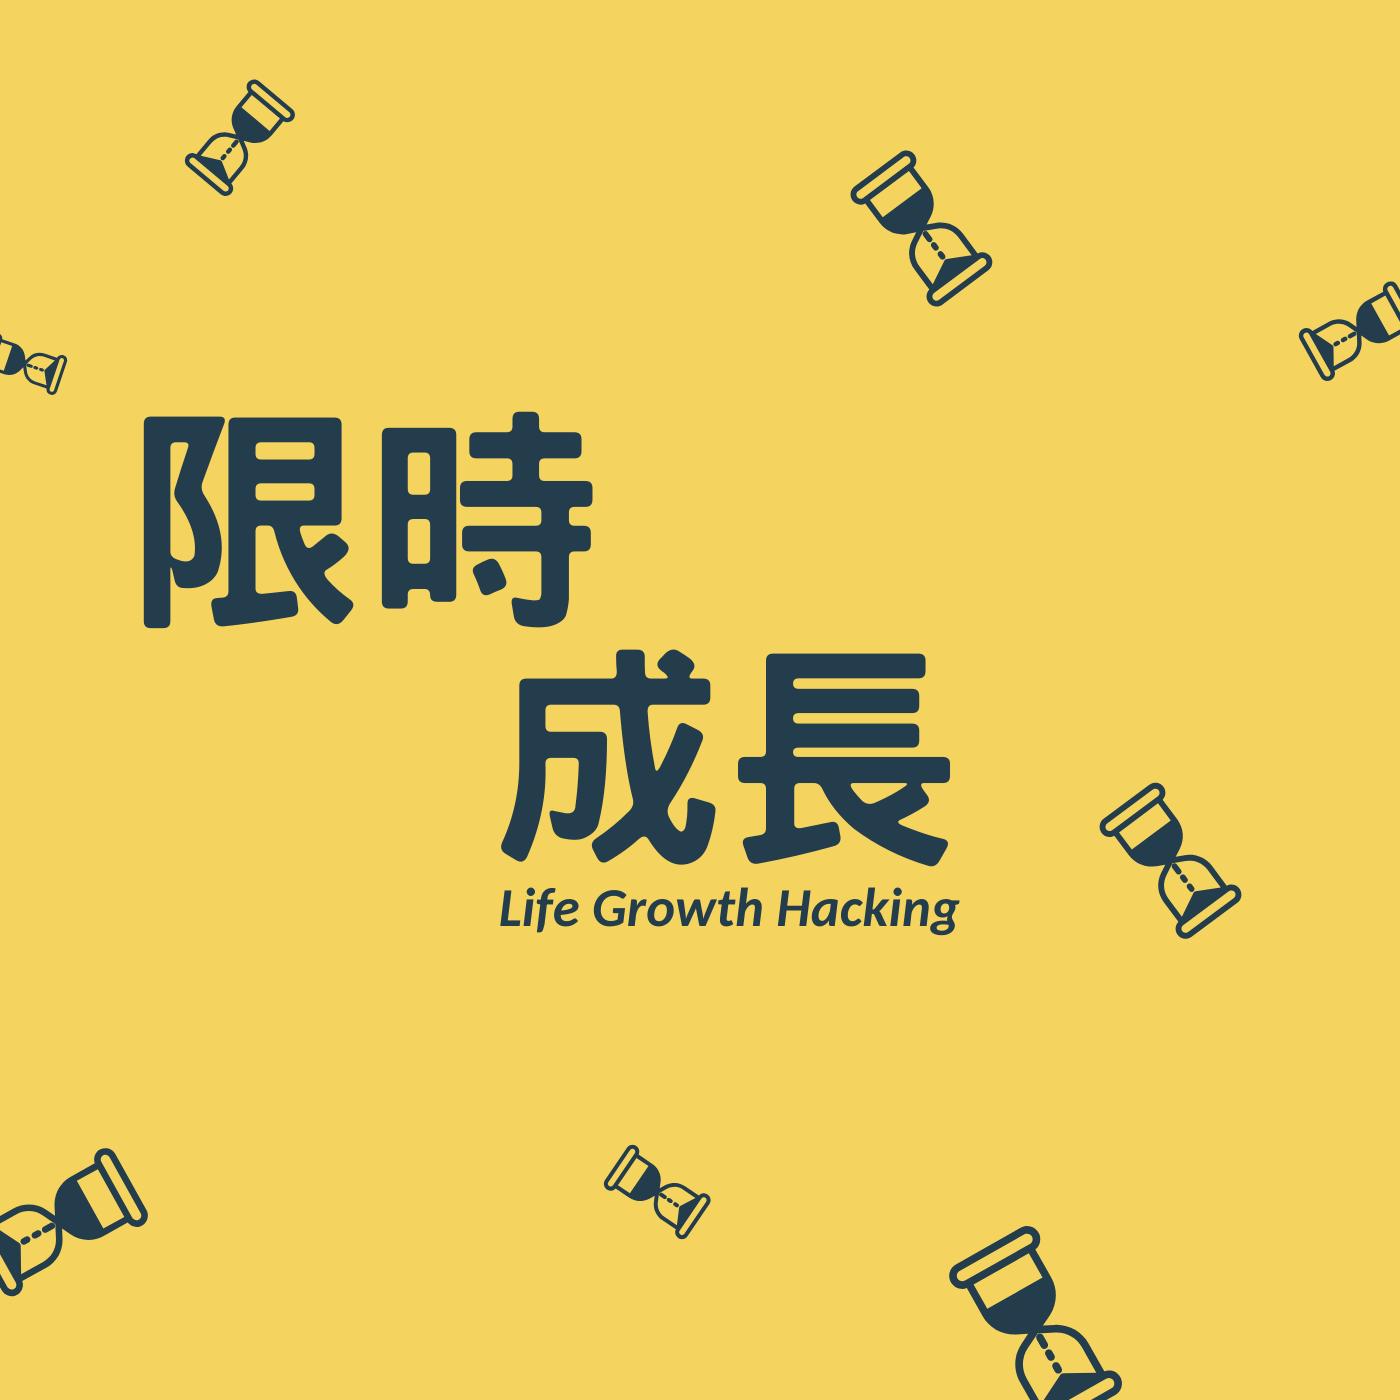 限時成長 - LifeGrowthHacking